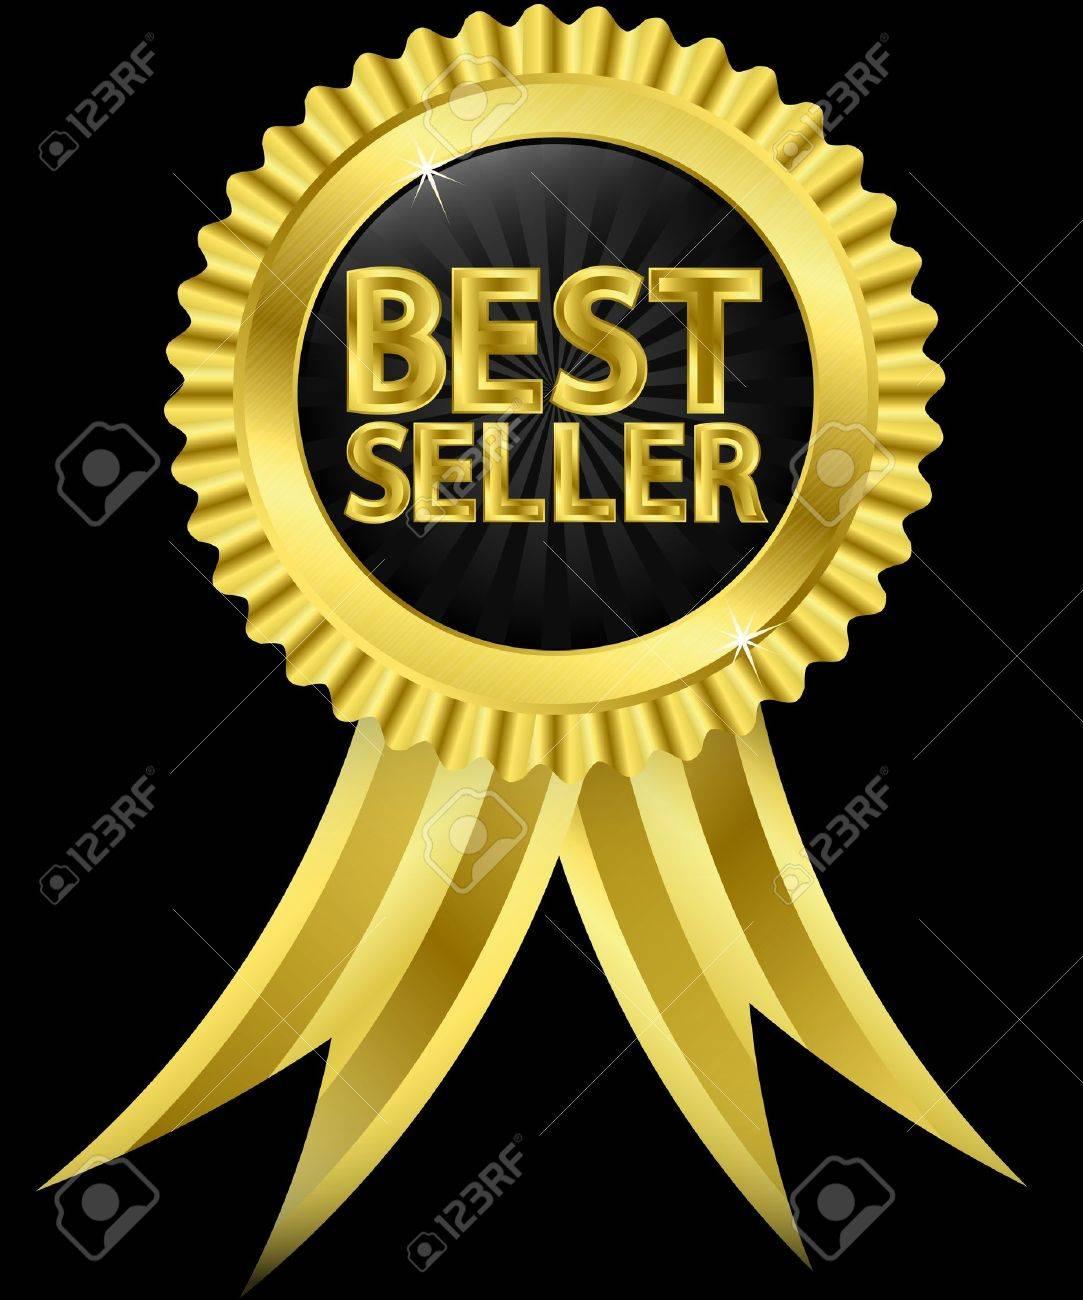 Best seller golden label with golden ribbons, vector illustration Stock Vector - 14634671